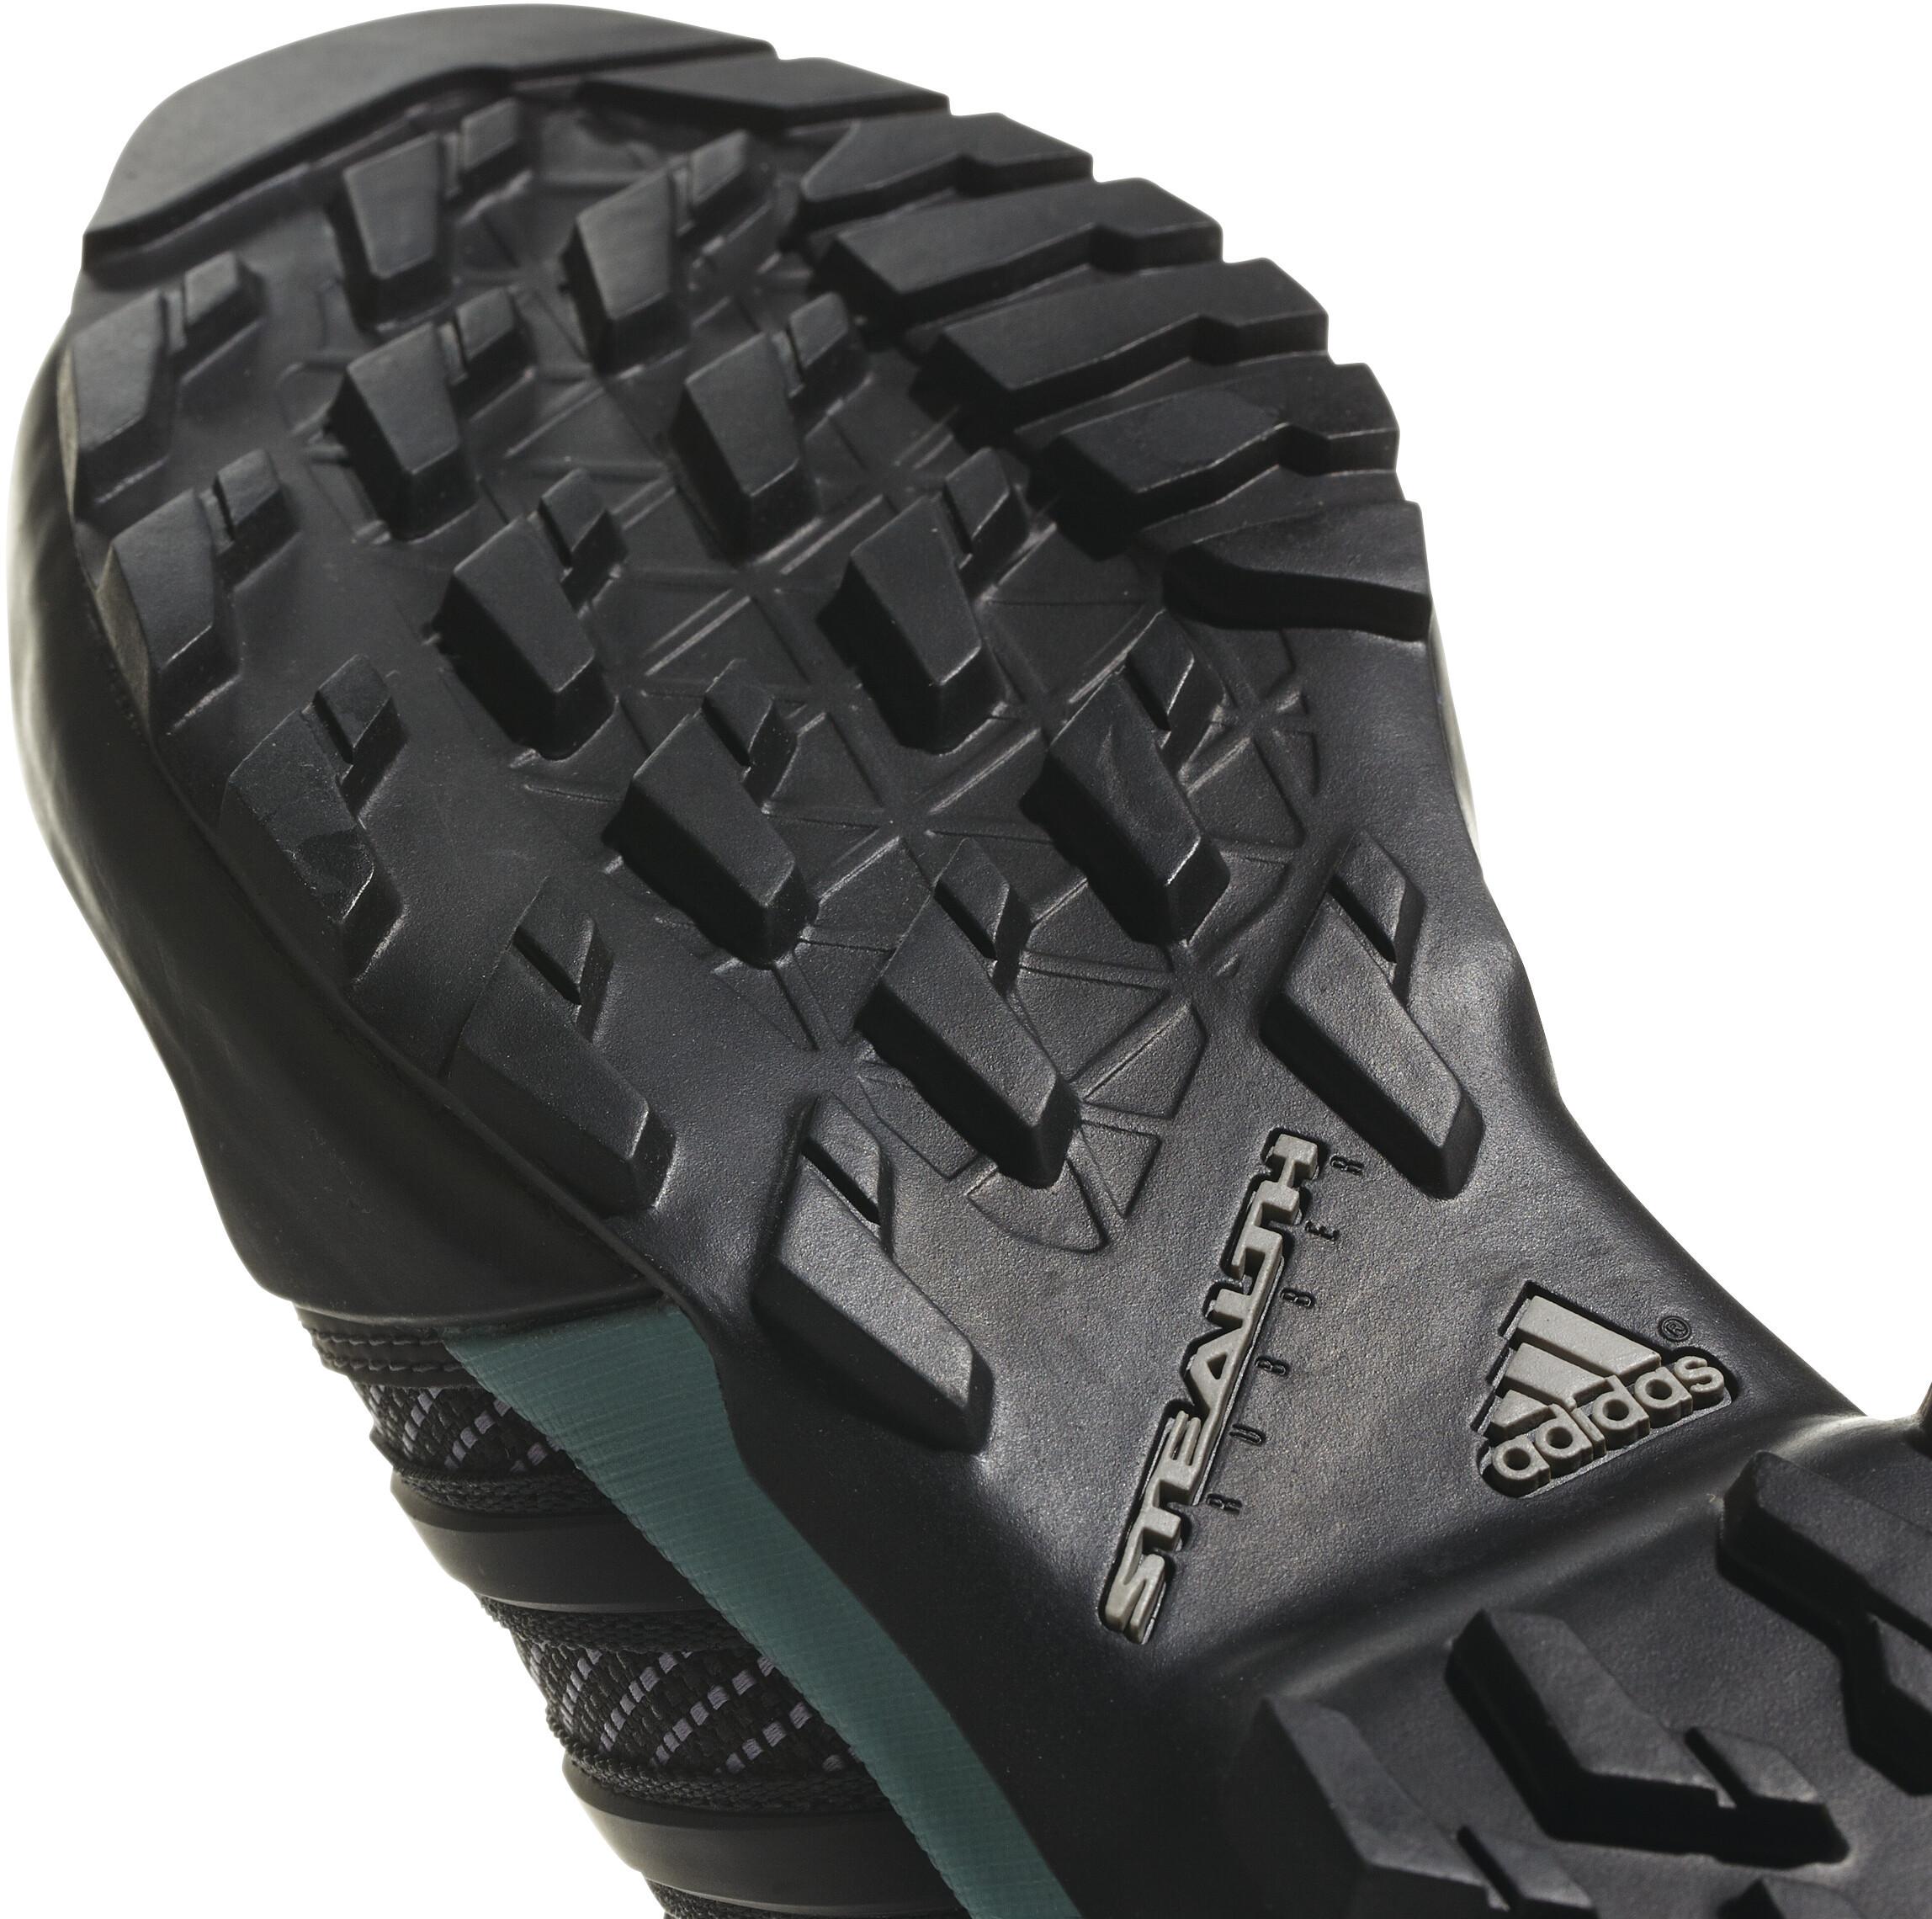 super popular 342a8 937fd adidas TERREX Scope GTX Scarpe Donna grigio nero